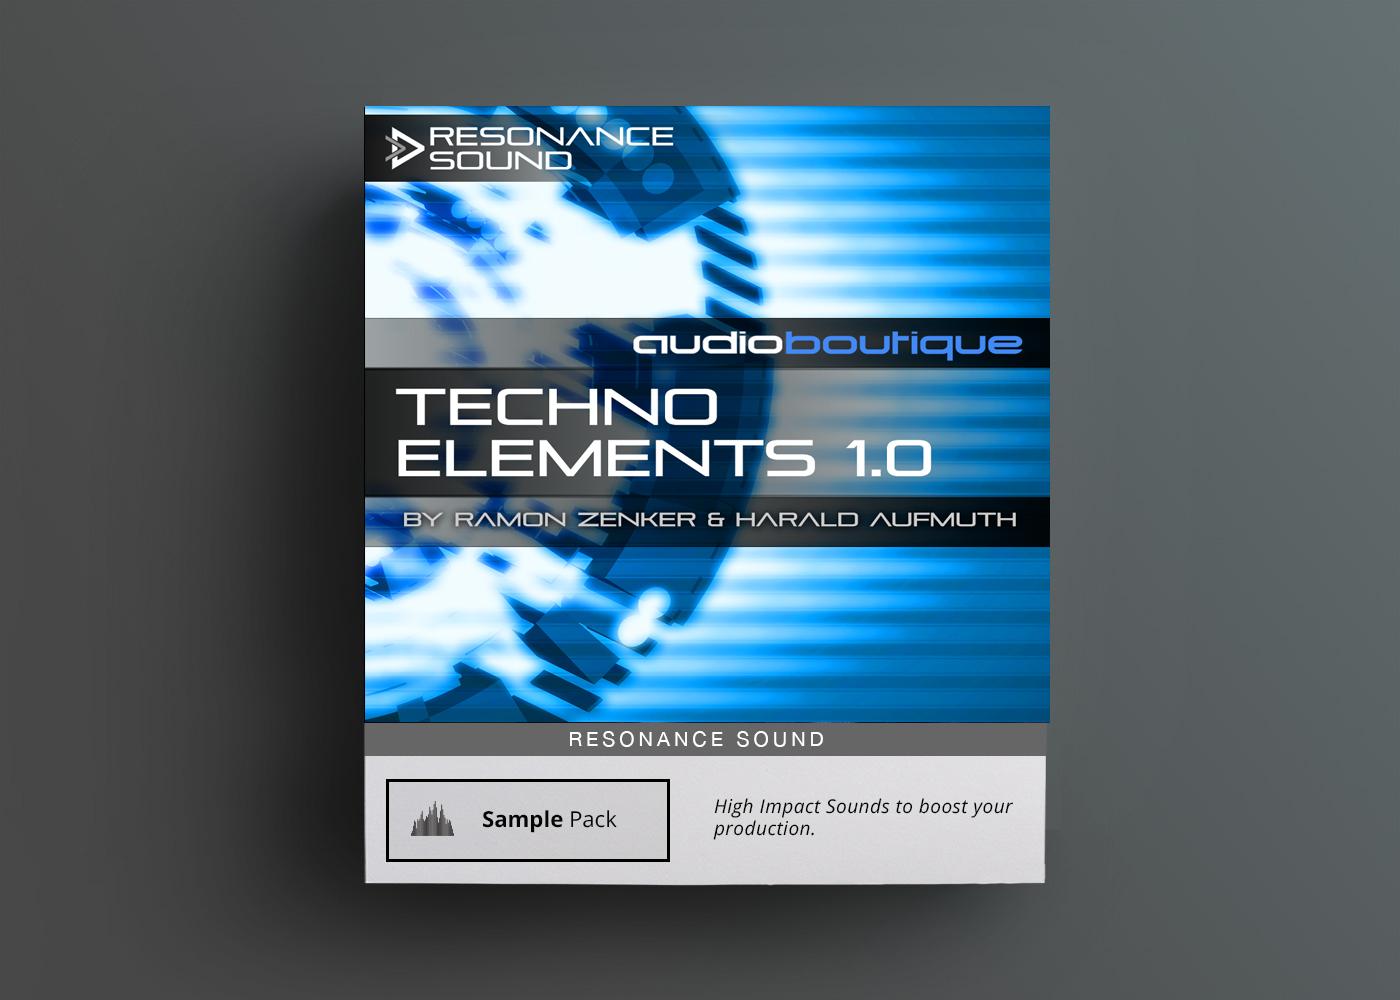 resonance-sound-techno-elements